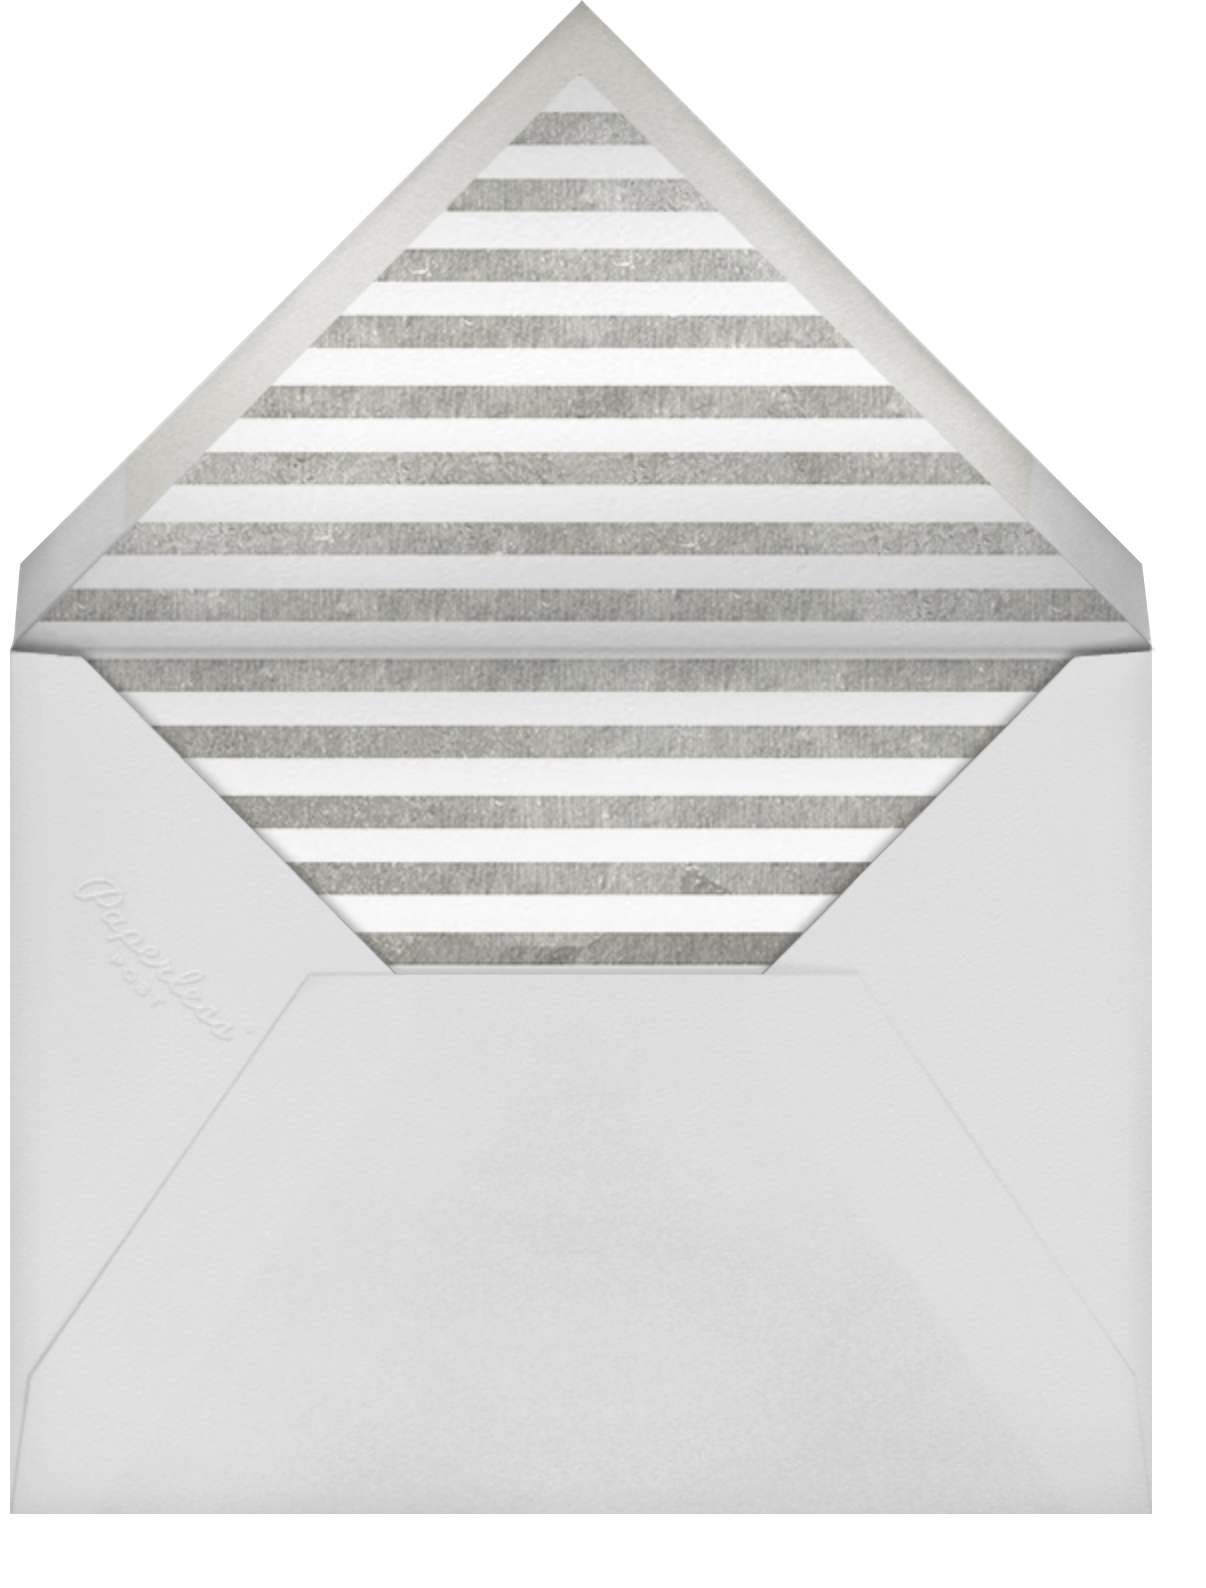 Saint-Preux (Photo) - White/Silver - Paperless Post - Photo  - envelope back